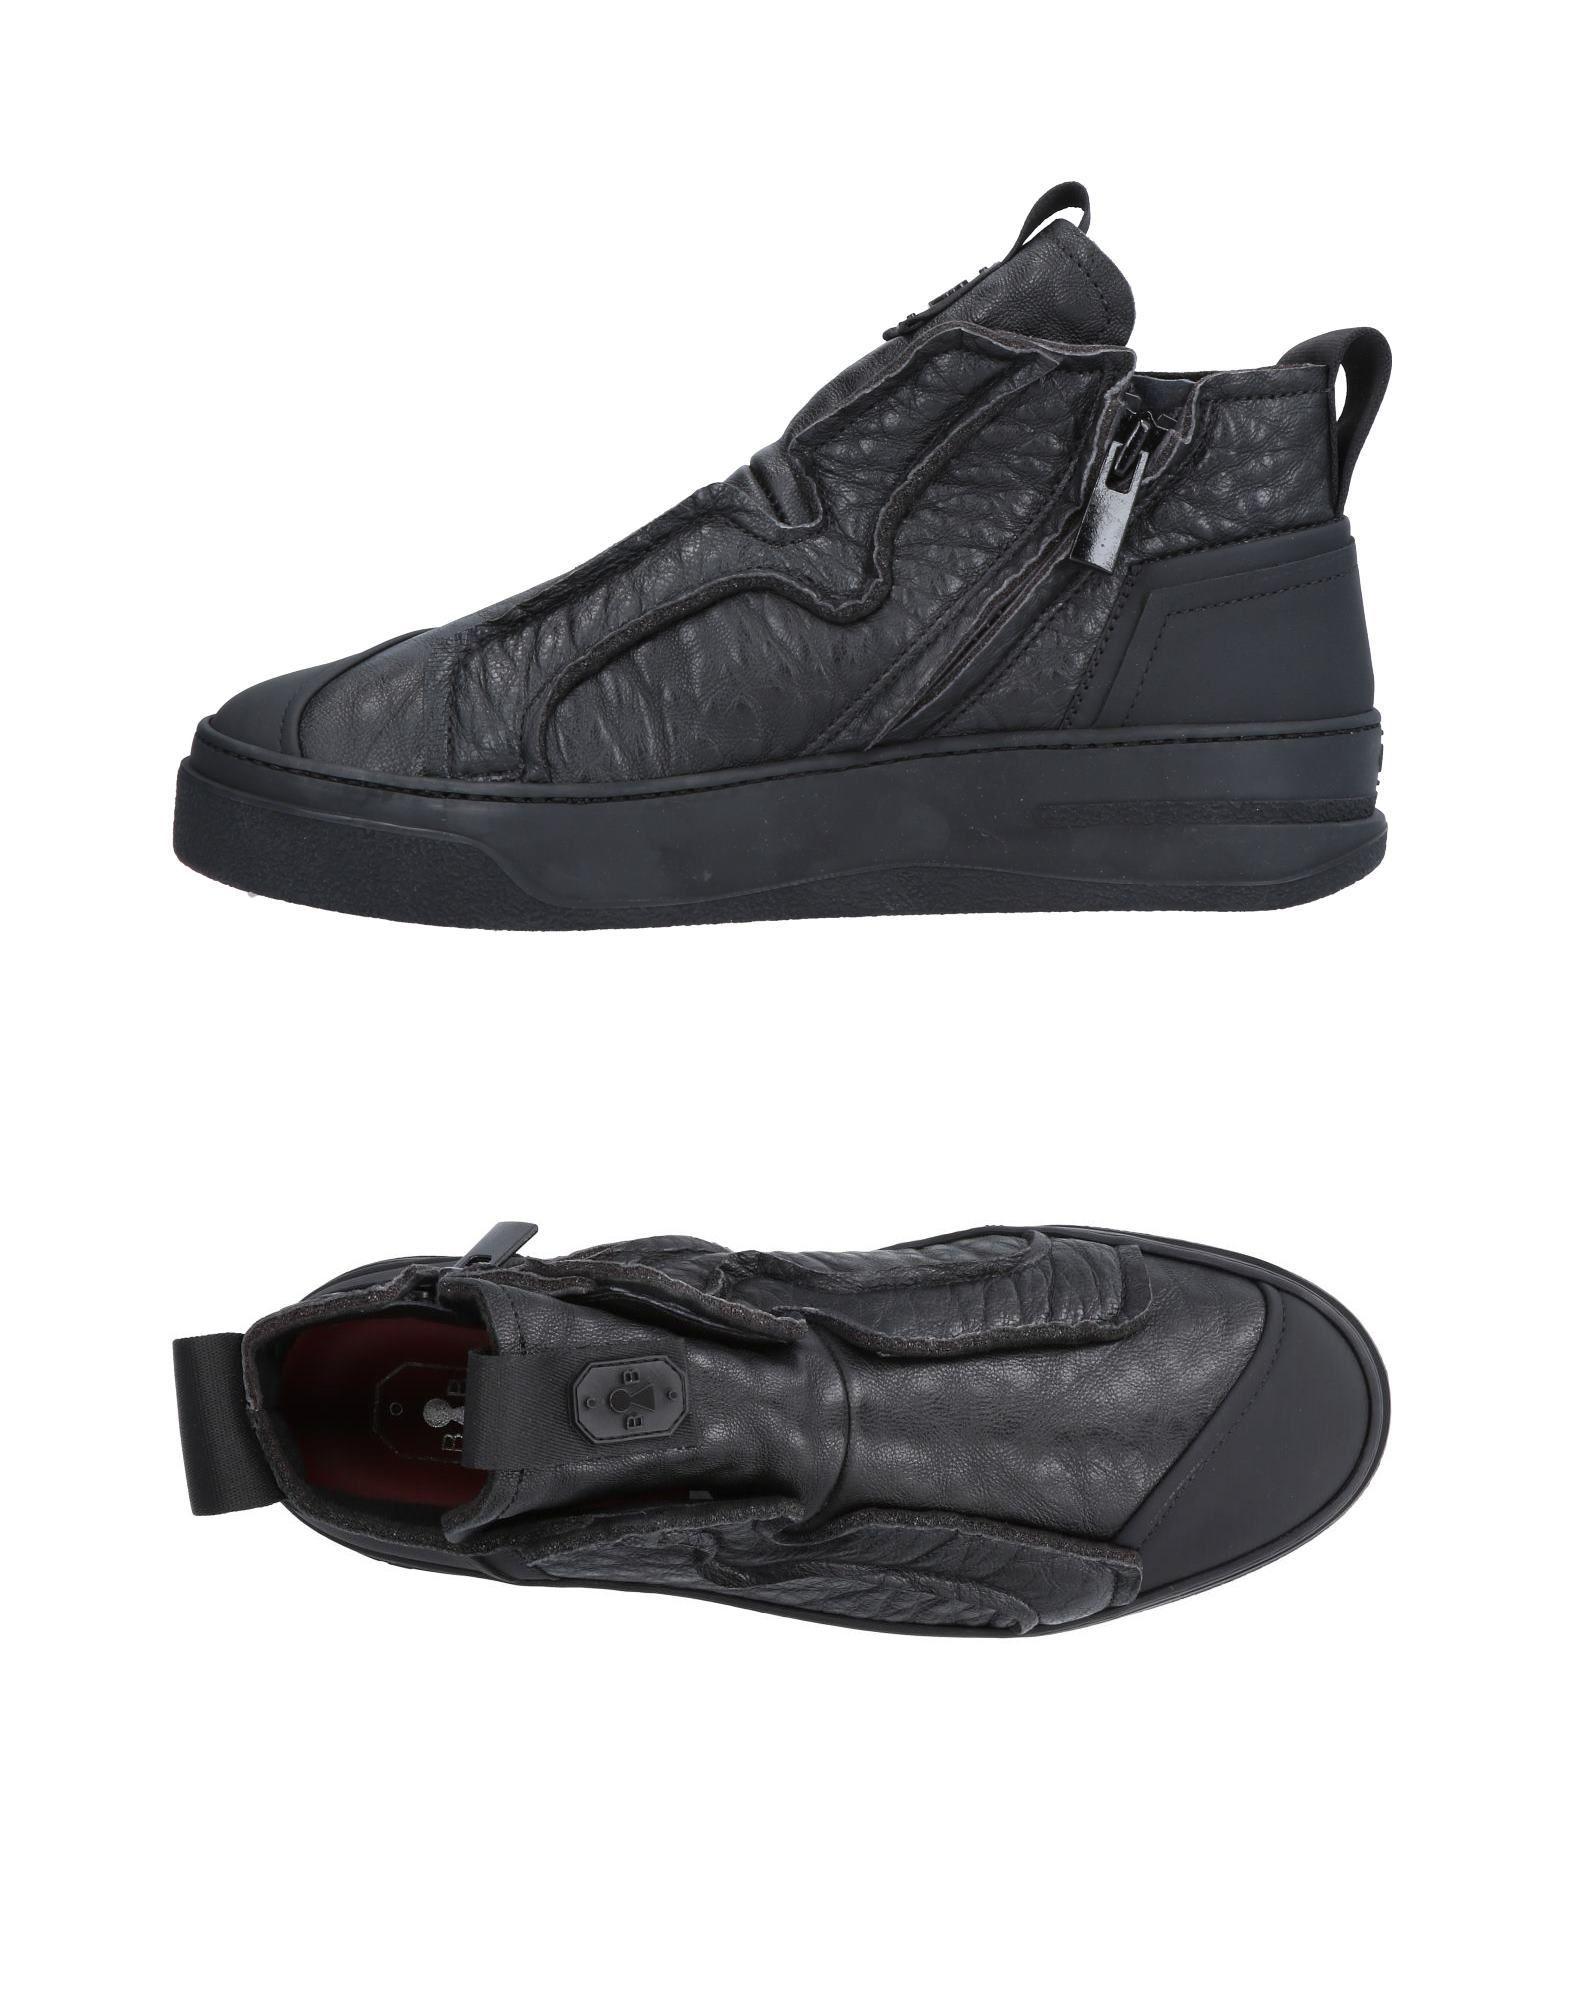 Bruno Bordese Sneakers Herren  11496756WA Gute Qualität beliebte Schuhe